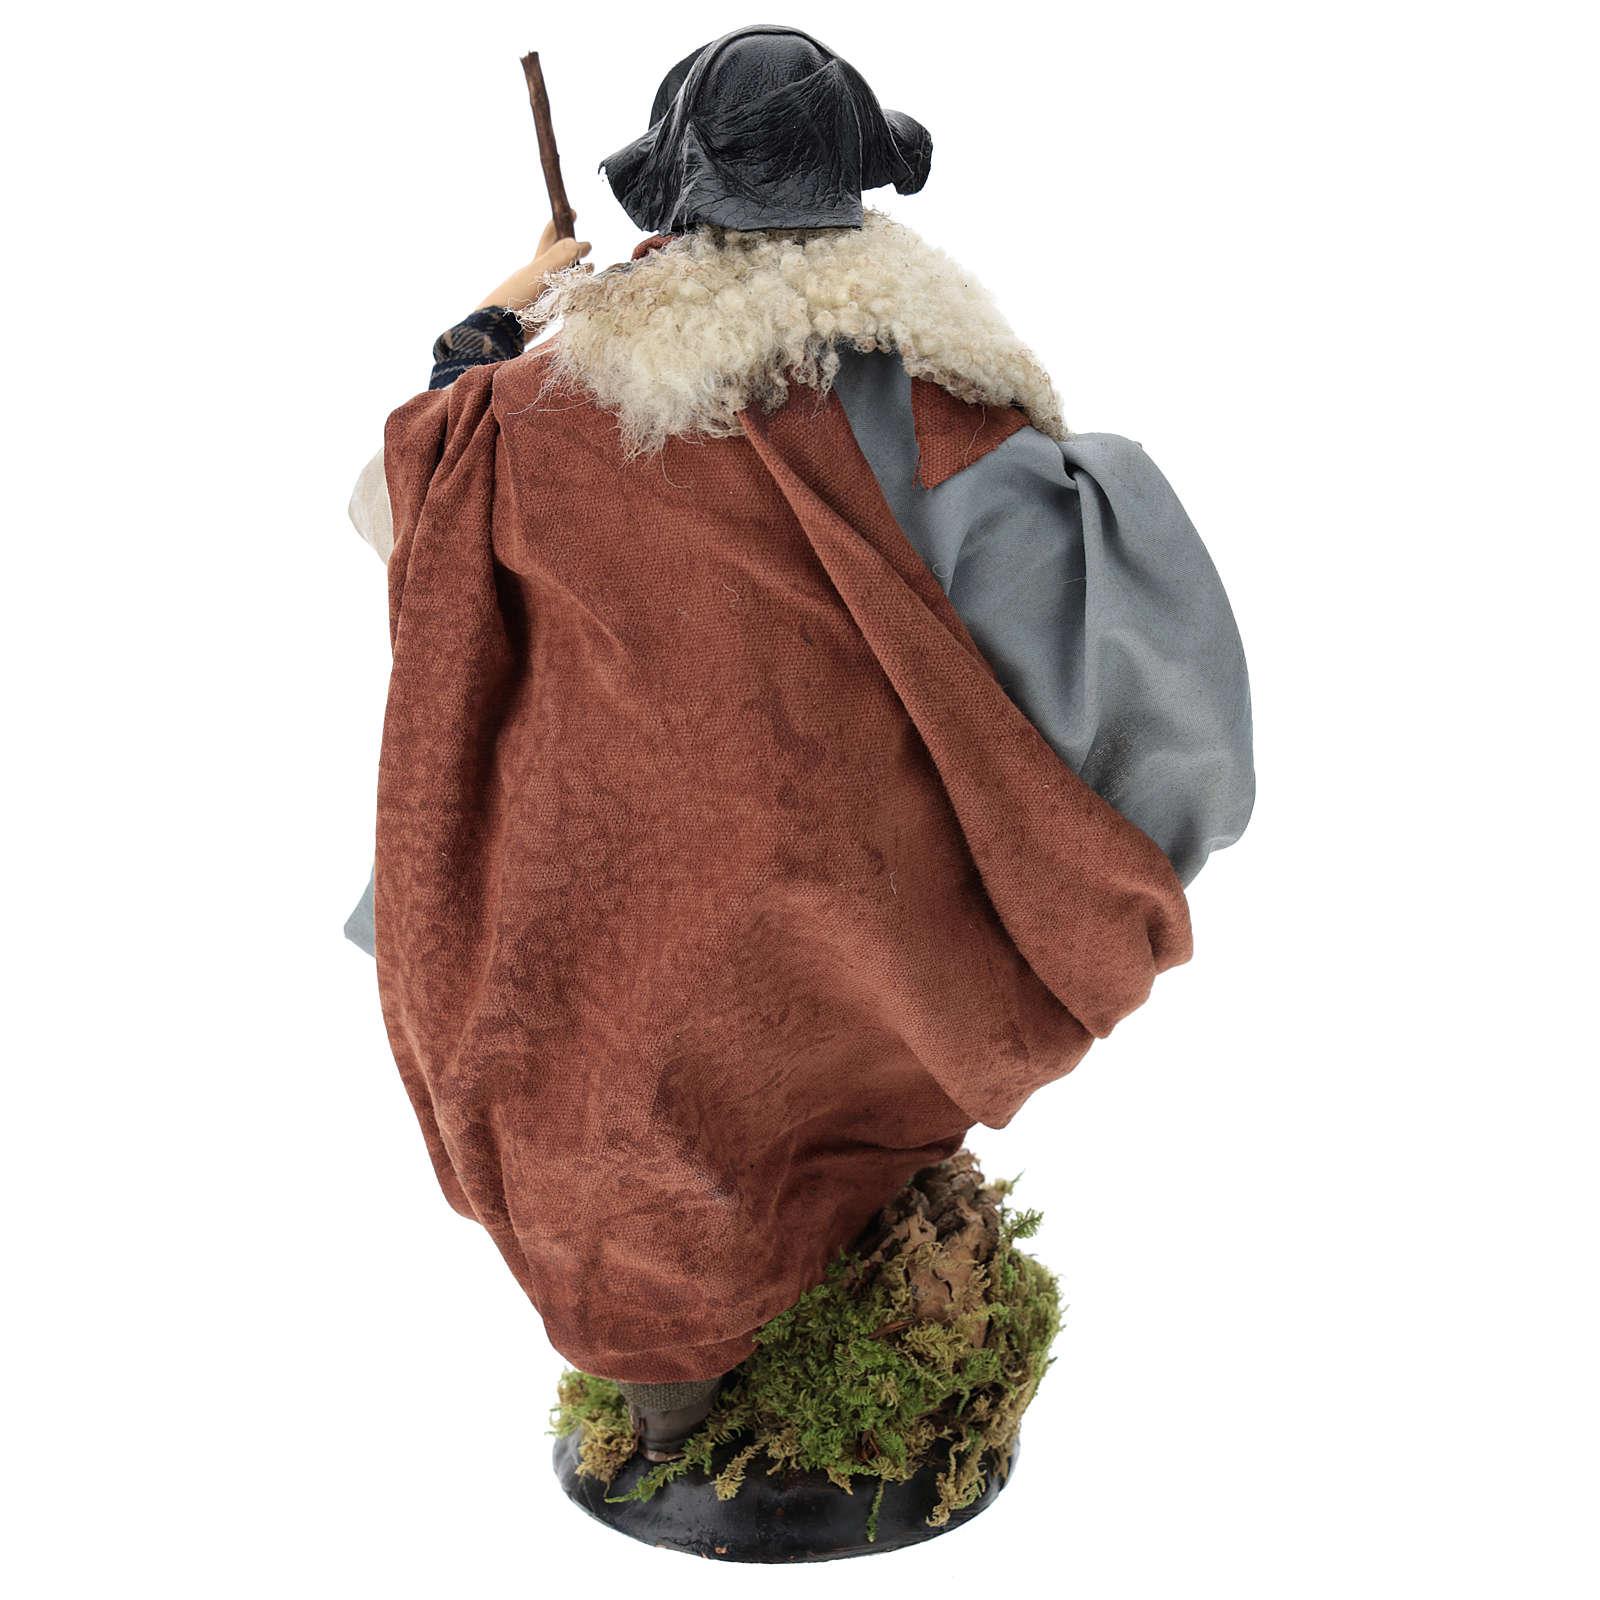 Neapolitan nativity figurine, shepherd with cane 30cm 4